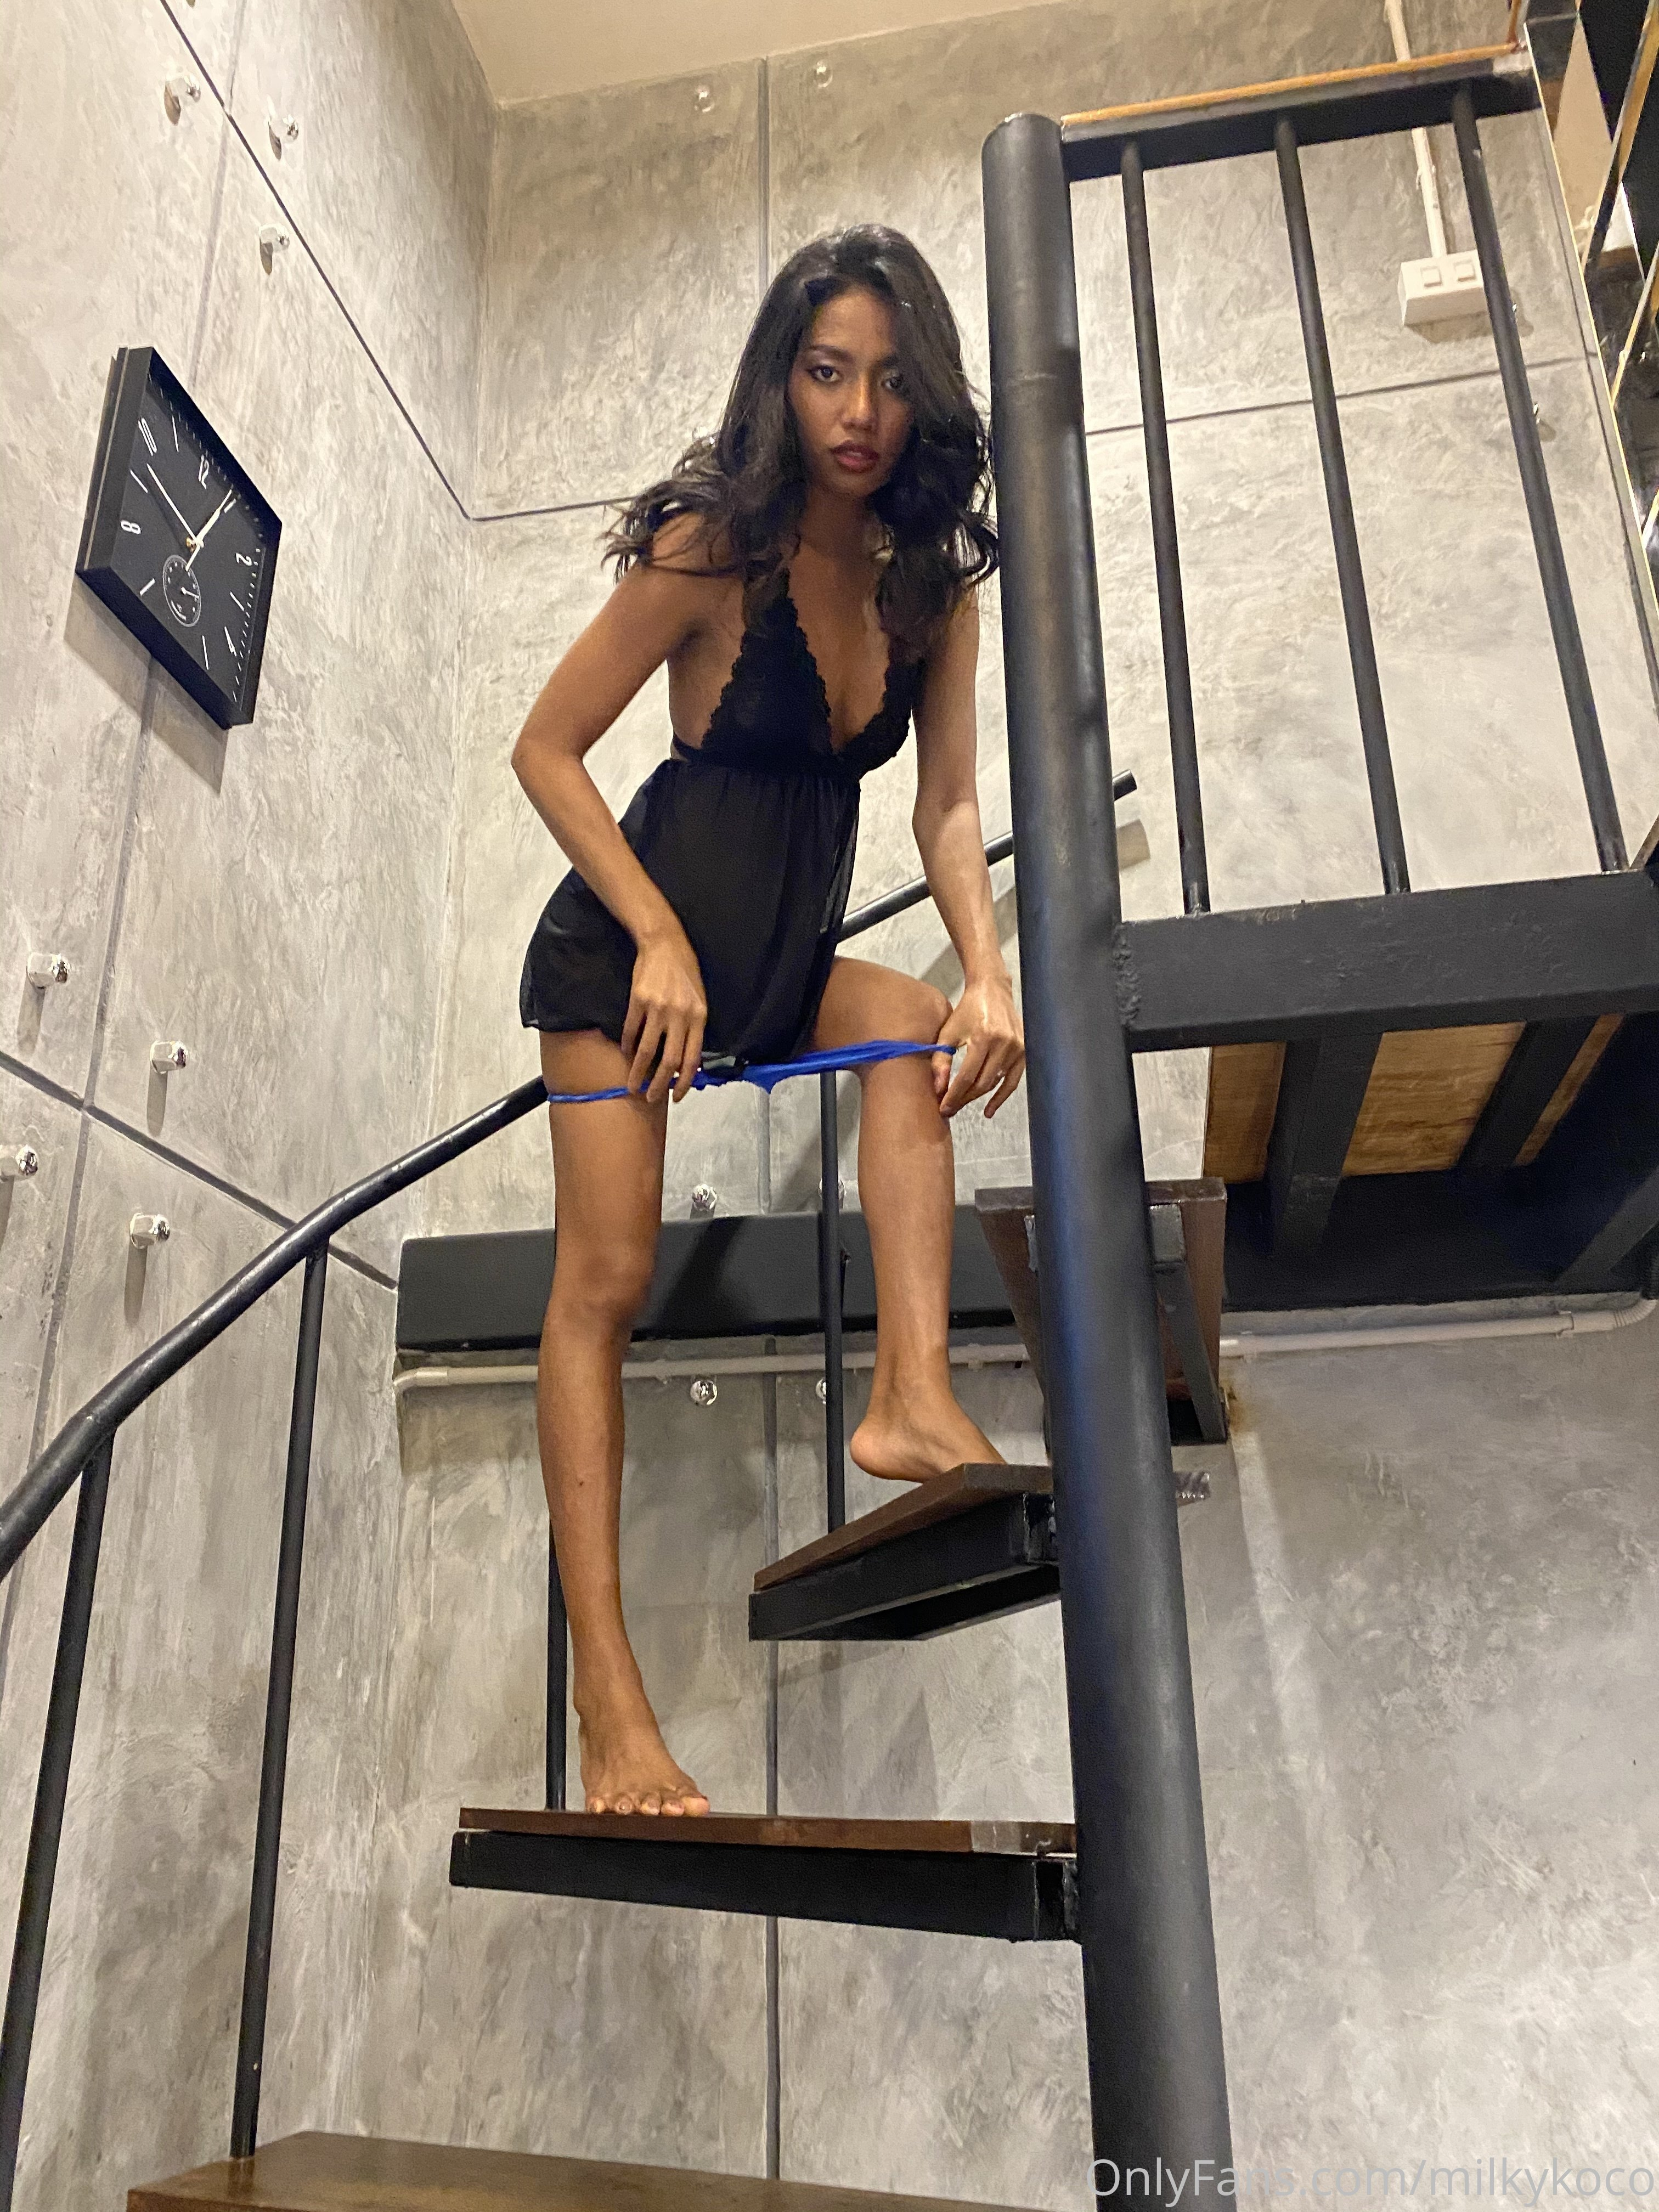 Koko Mylk Bangkok Model Leaked Onlyfans 0062